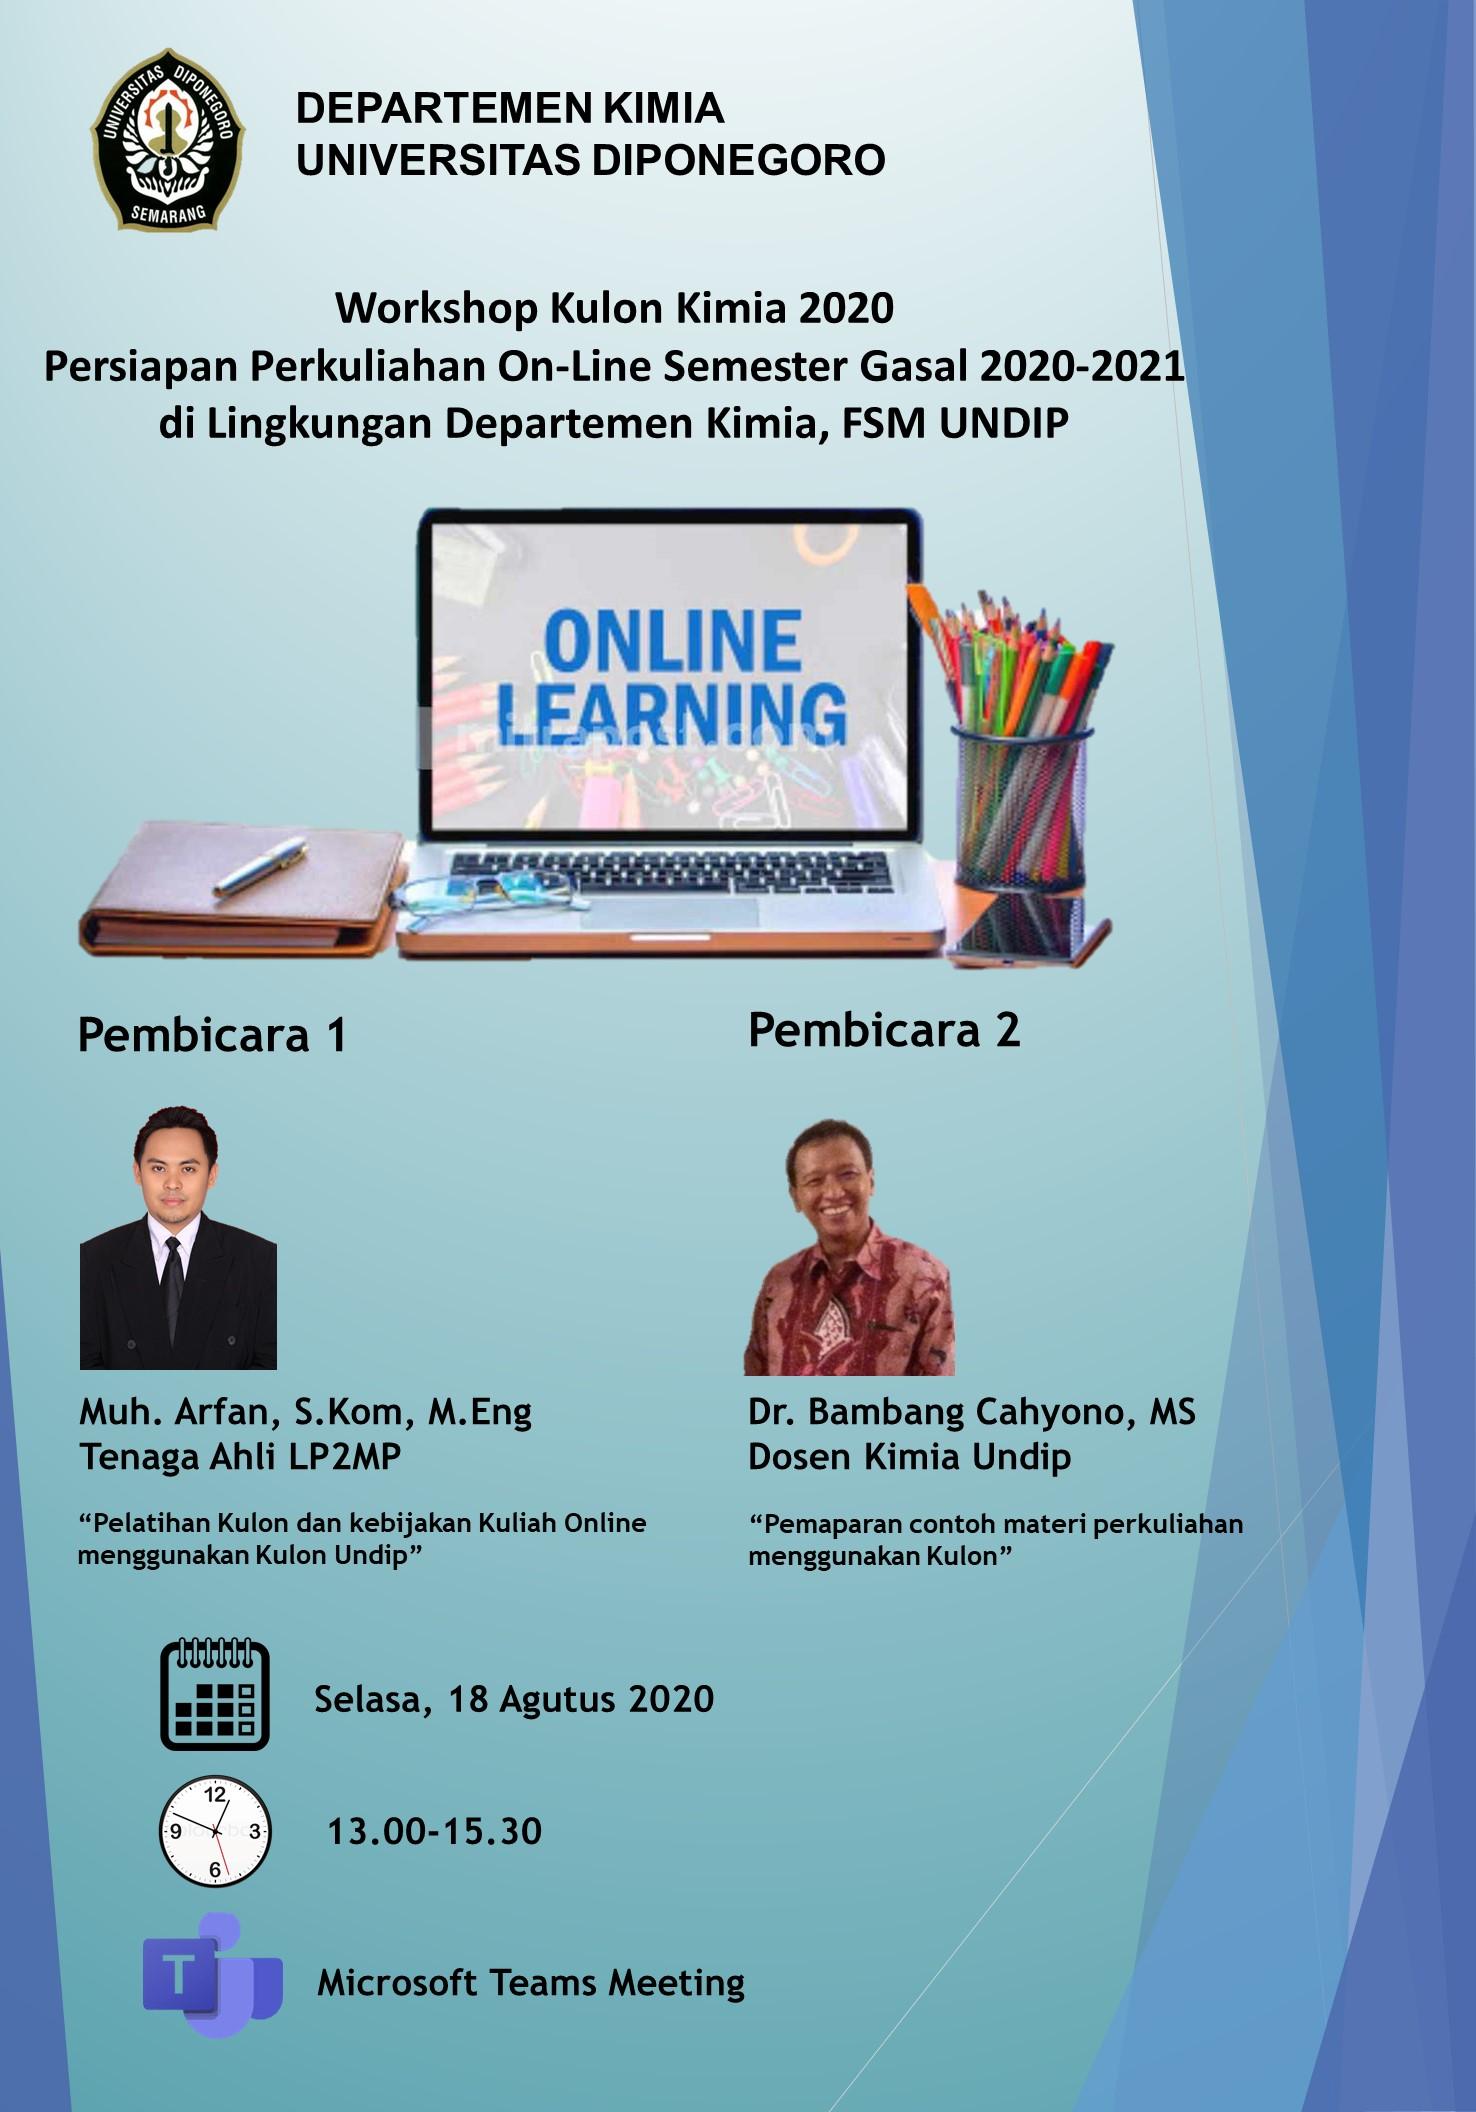 Workshop Kulon Kimia 2020: Persiapan Perkuliahan On-Line Semester Gasal 2020-2021 di Lingkungan Departemen Kimia, FSM UNDIP